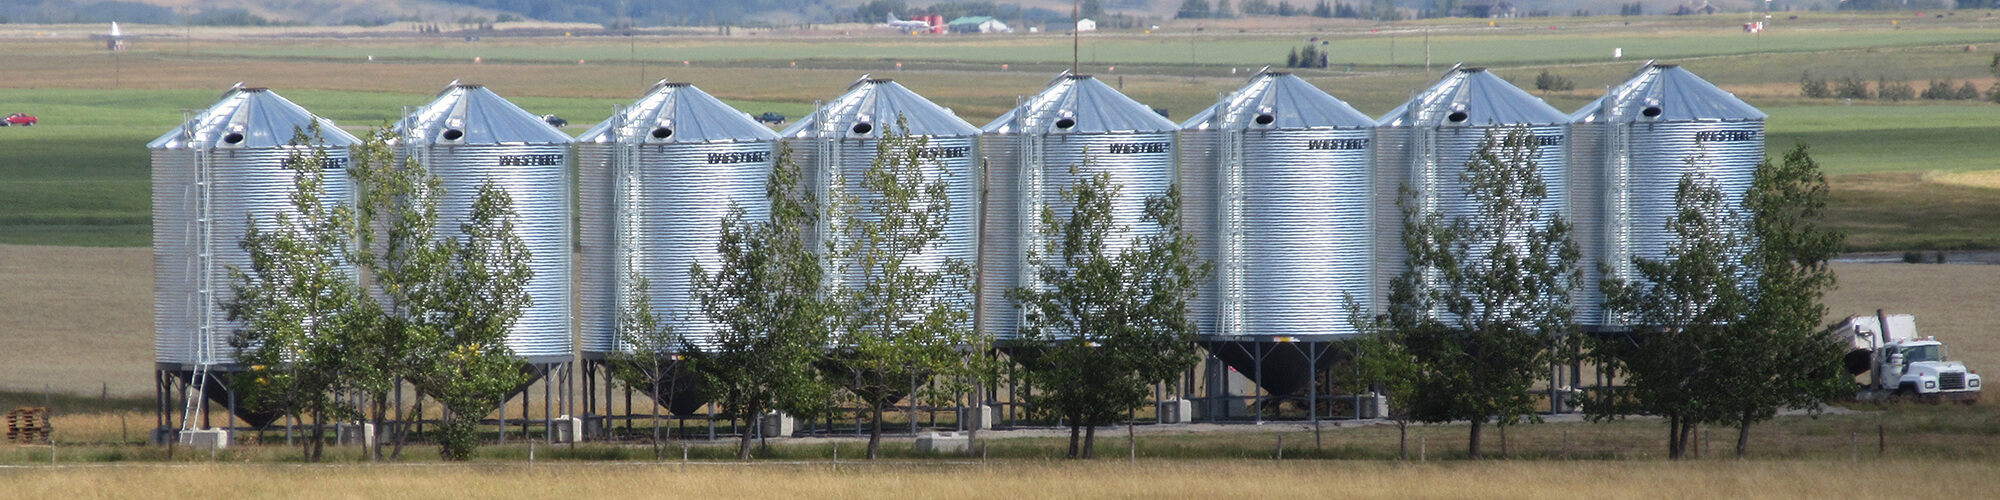 Grain Bins